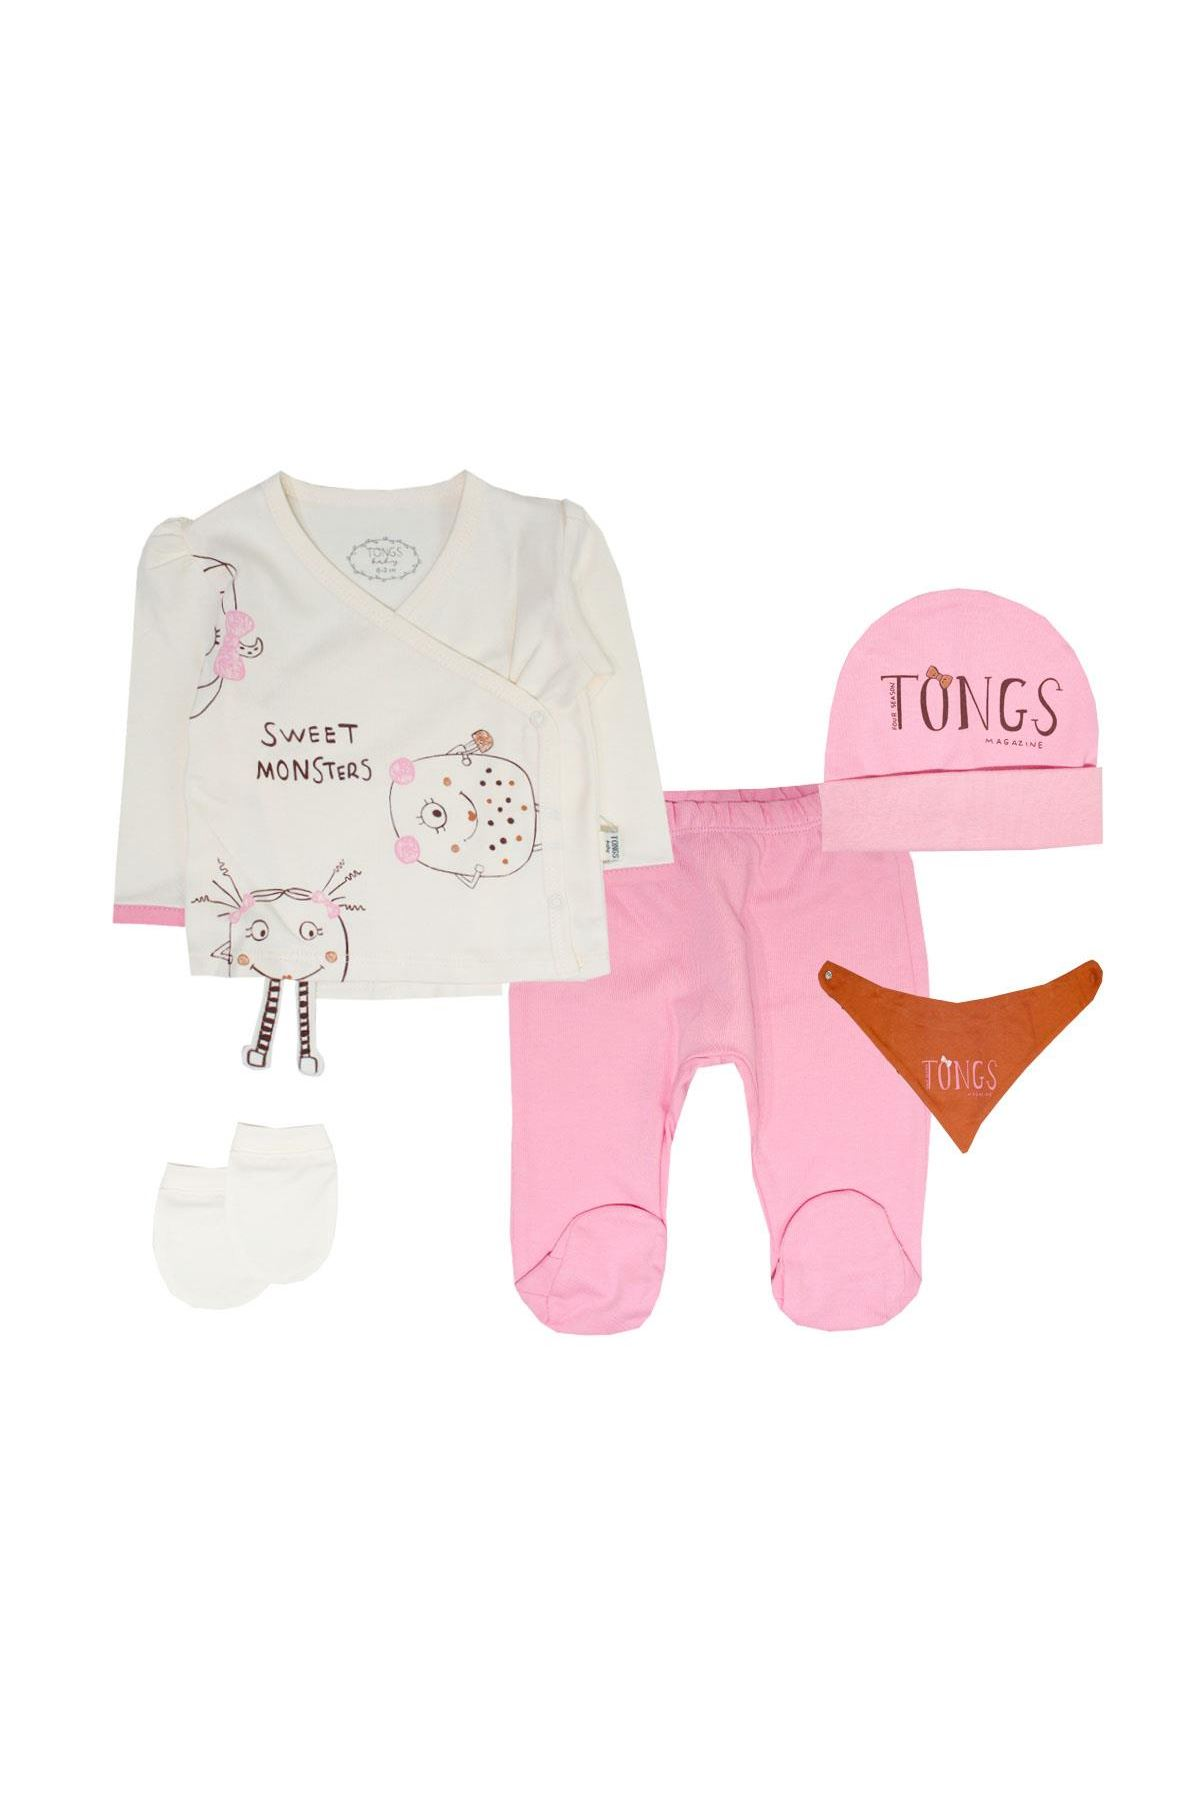 Tongs Baby Bebe Zıbın Takım 2635 Pembe